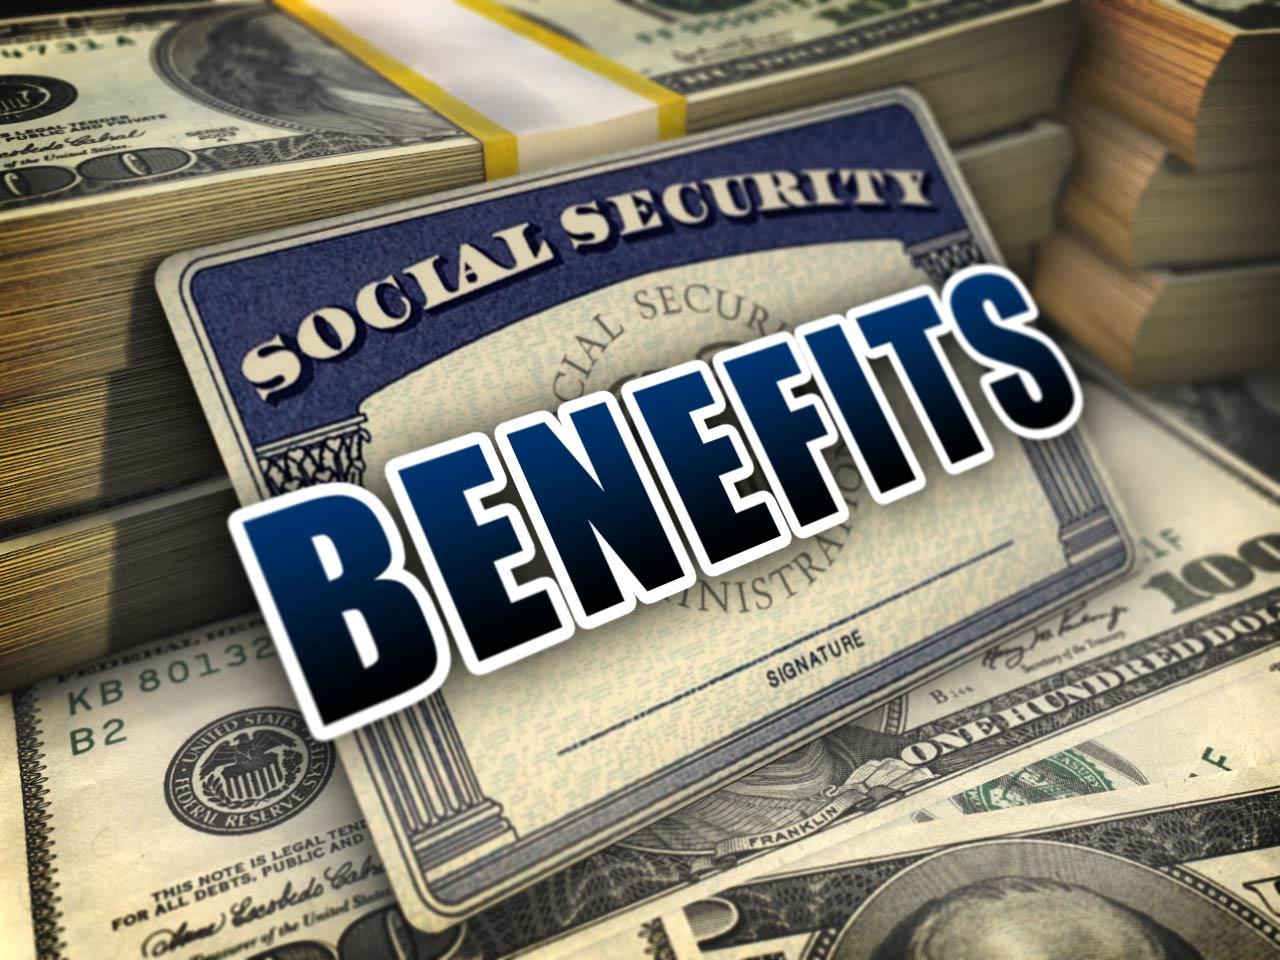 SOCIAL SECURITY BENEFITS_1519435114024.png.jpg